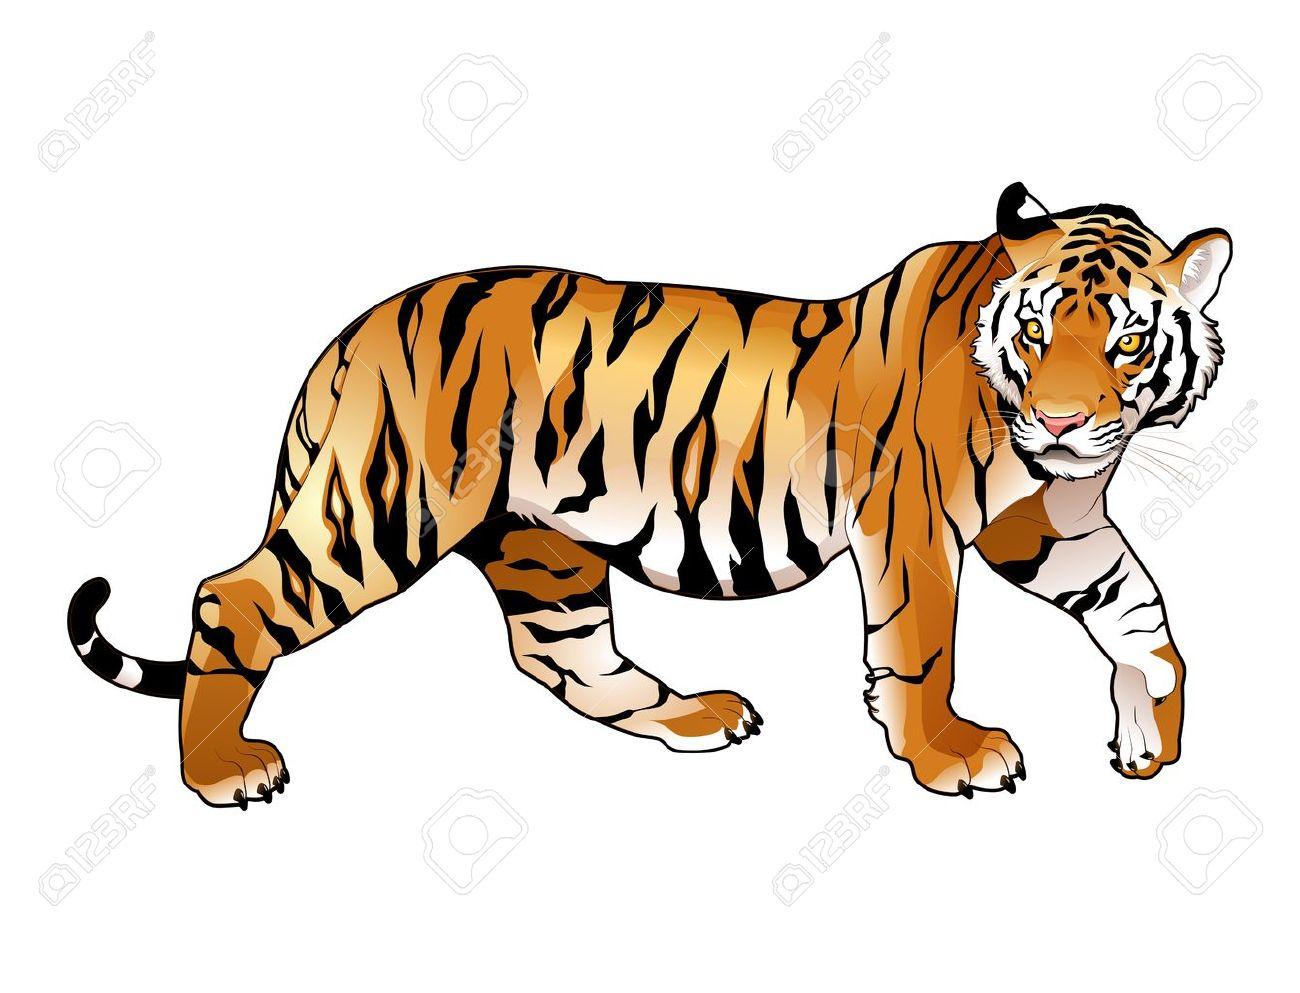 tiger clipart face